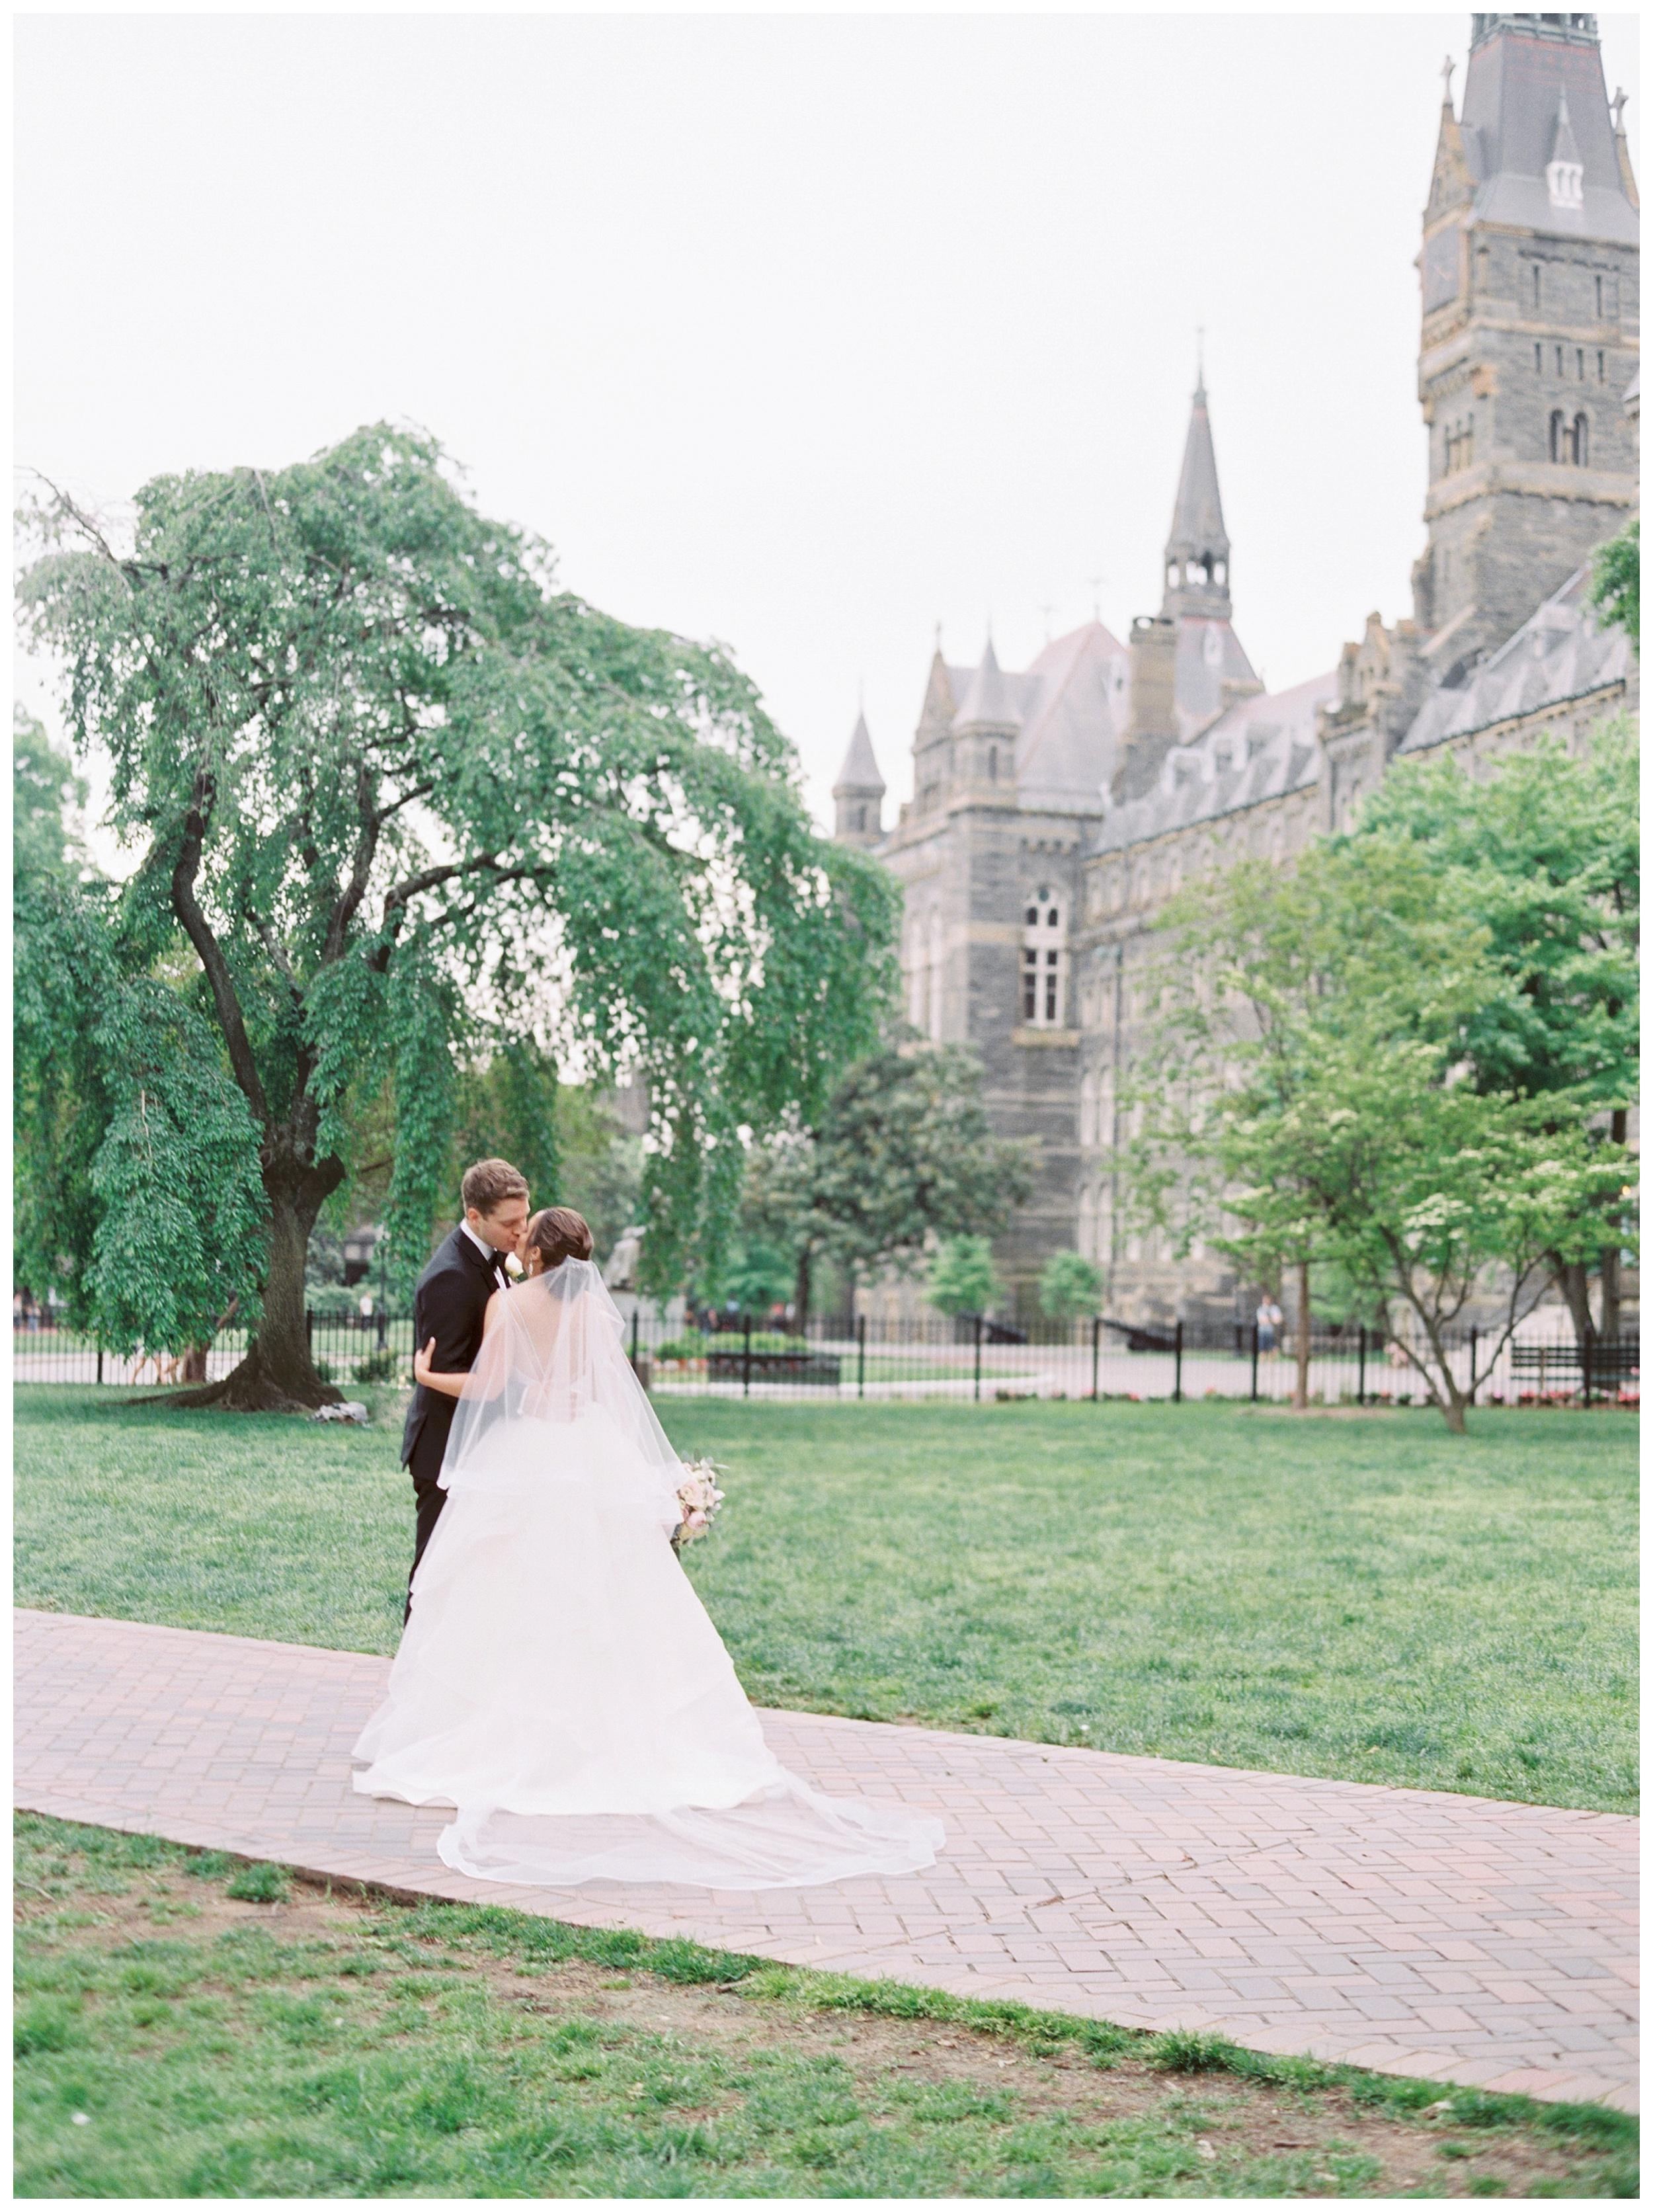 DAR Constitution Hall Wedding Wedding | Daughters of the American Revolution Wedding | District of Columbia Film Wedding Photographer Kir Tuben_0058.jpg